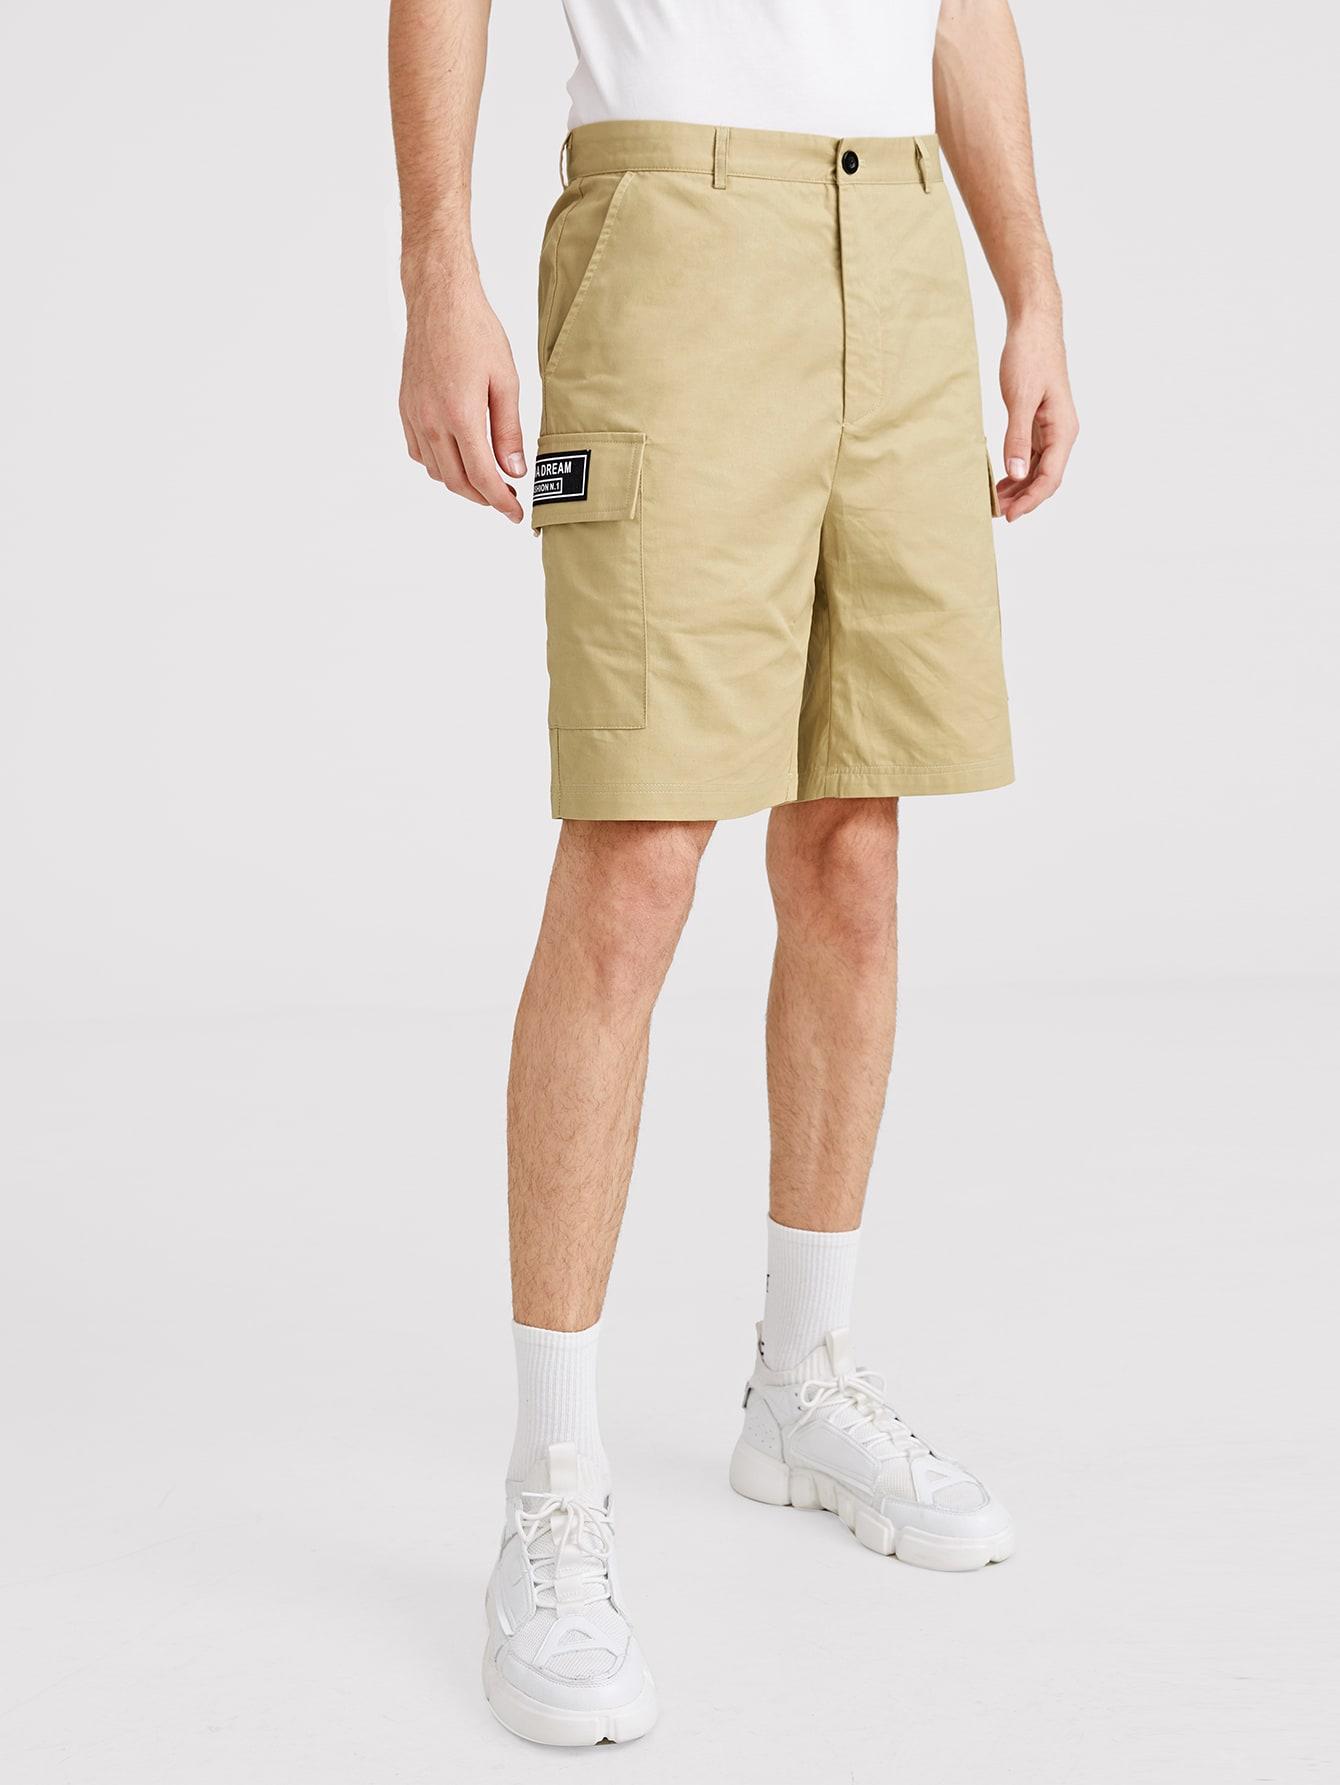 Купить Мужские шорты с крышками и кармана, Valerian, SheIn